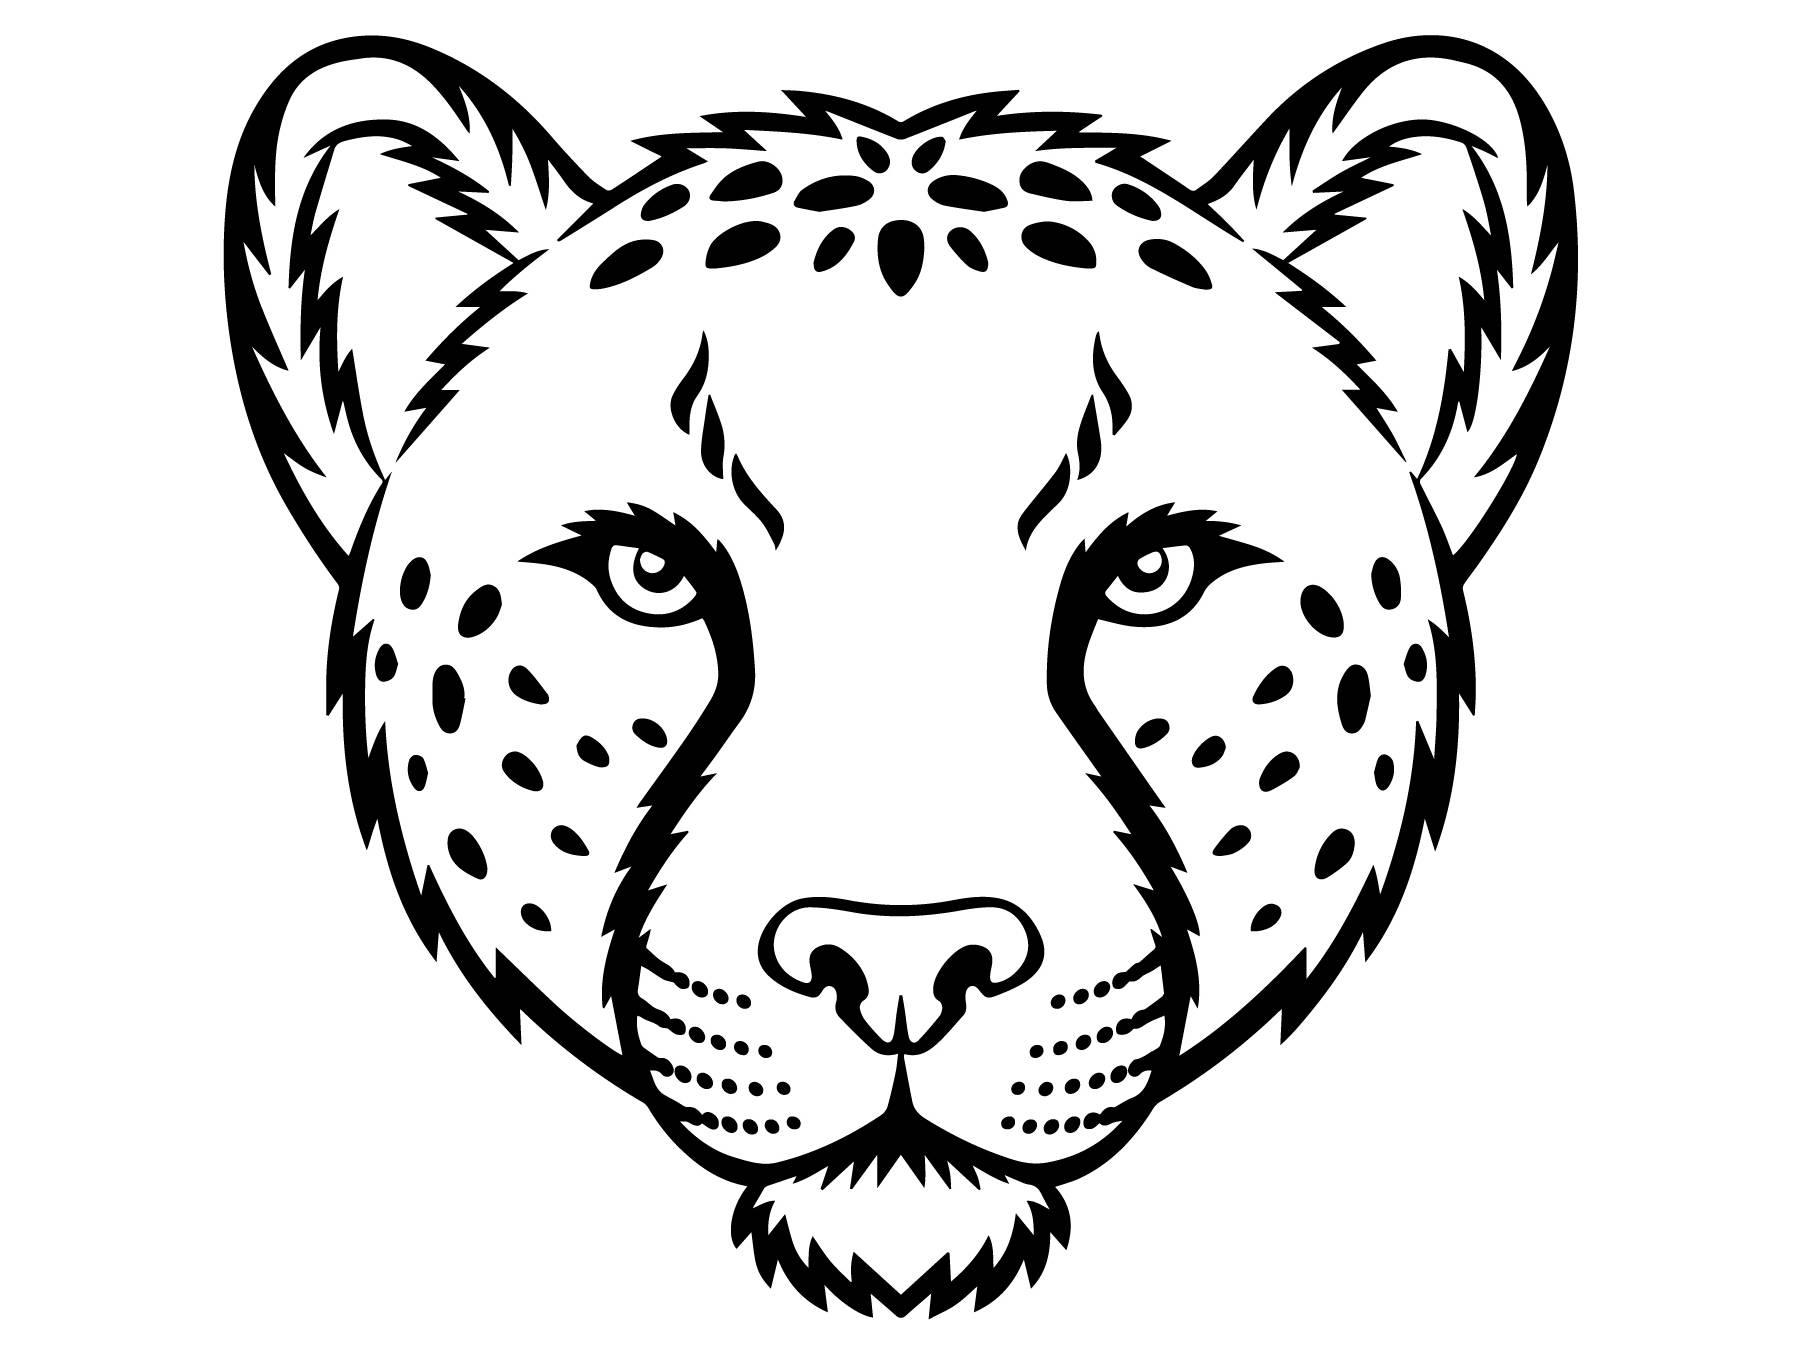 cheetah 7 leopard jaguar wild cat spots wildlife wild animal. Black Bedroom Furniture Sets. Home Design Ideas